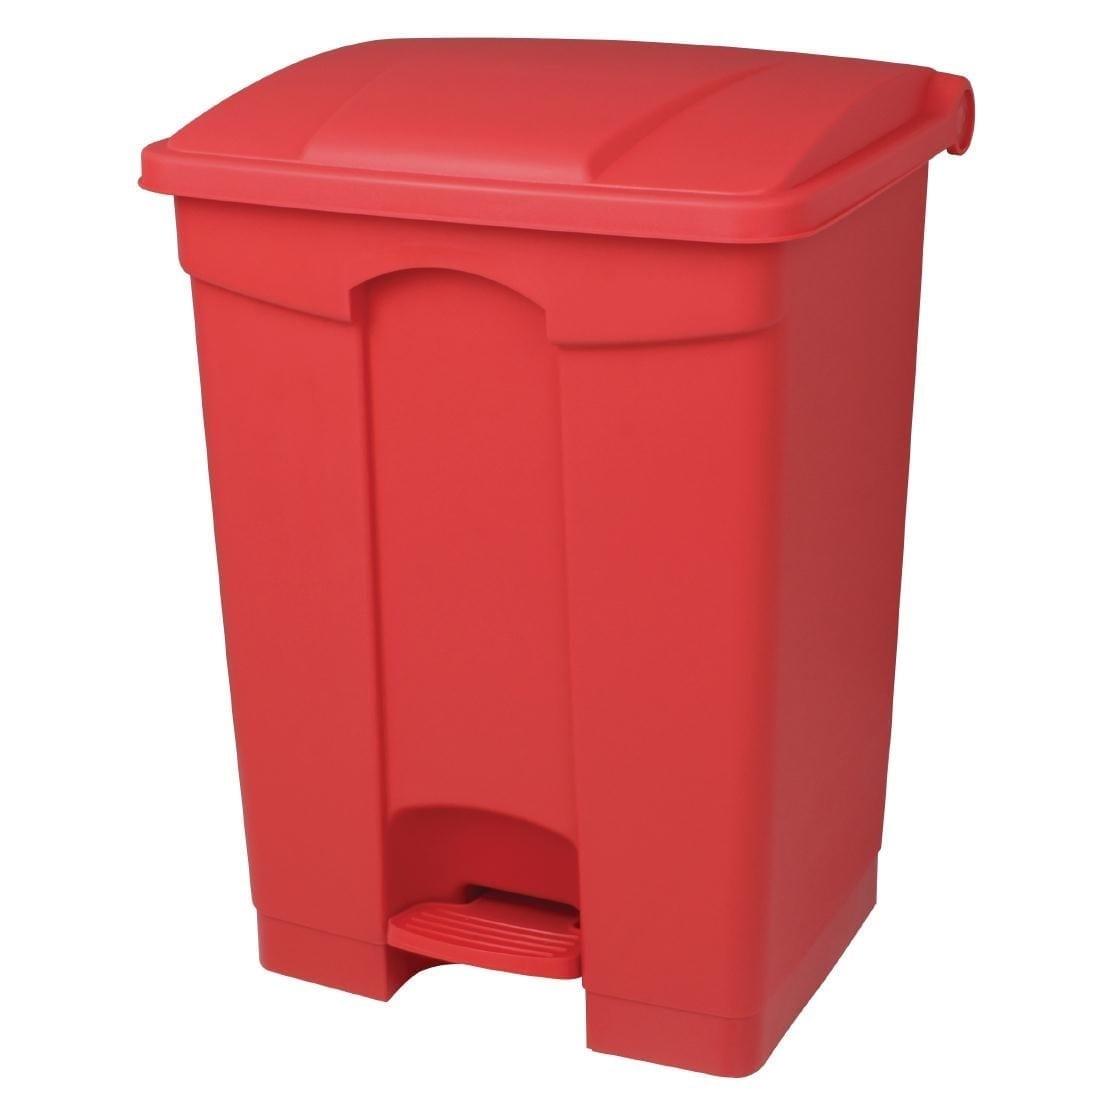 Jantex Kitchen Pedal Bin Red - 65Ltr-0